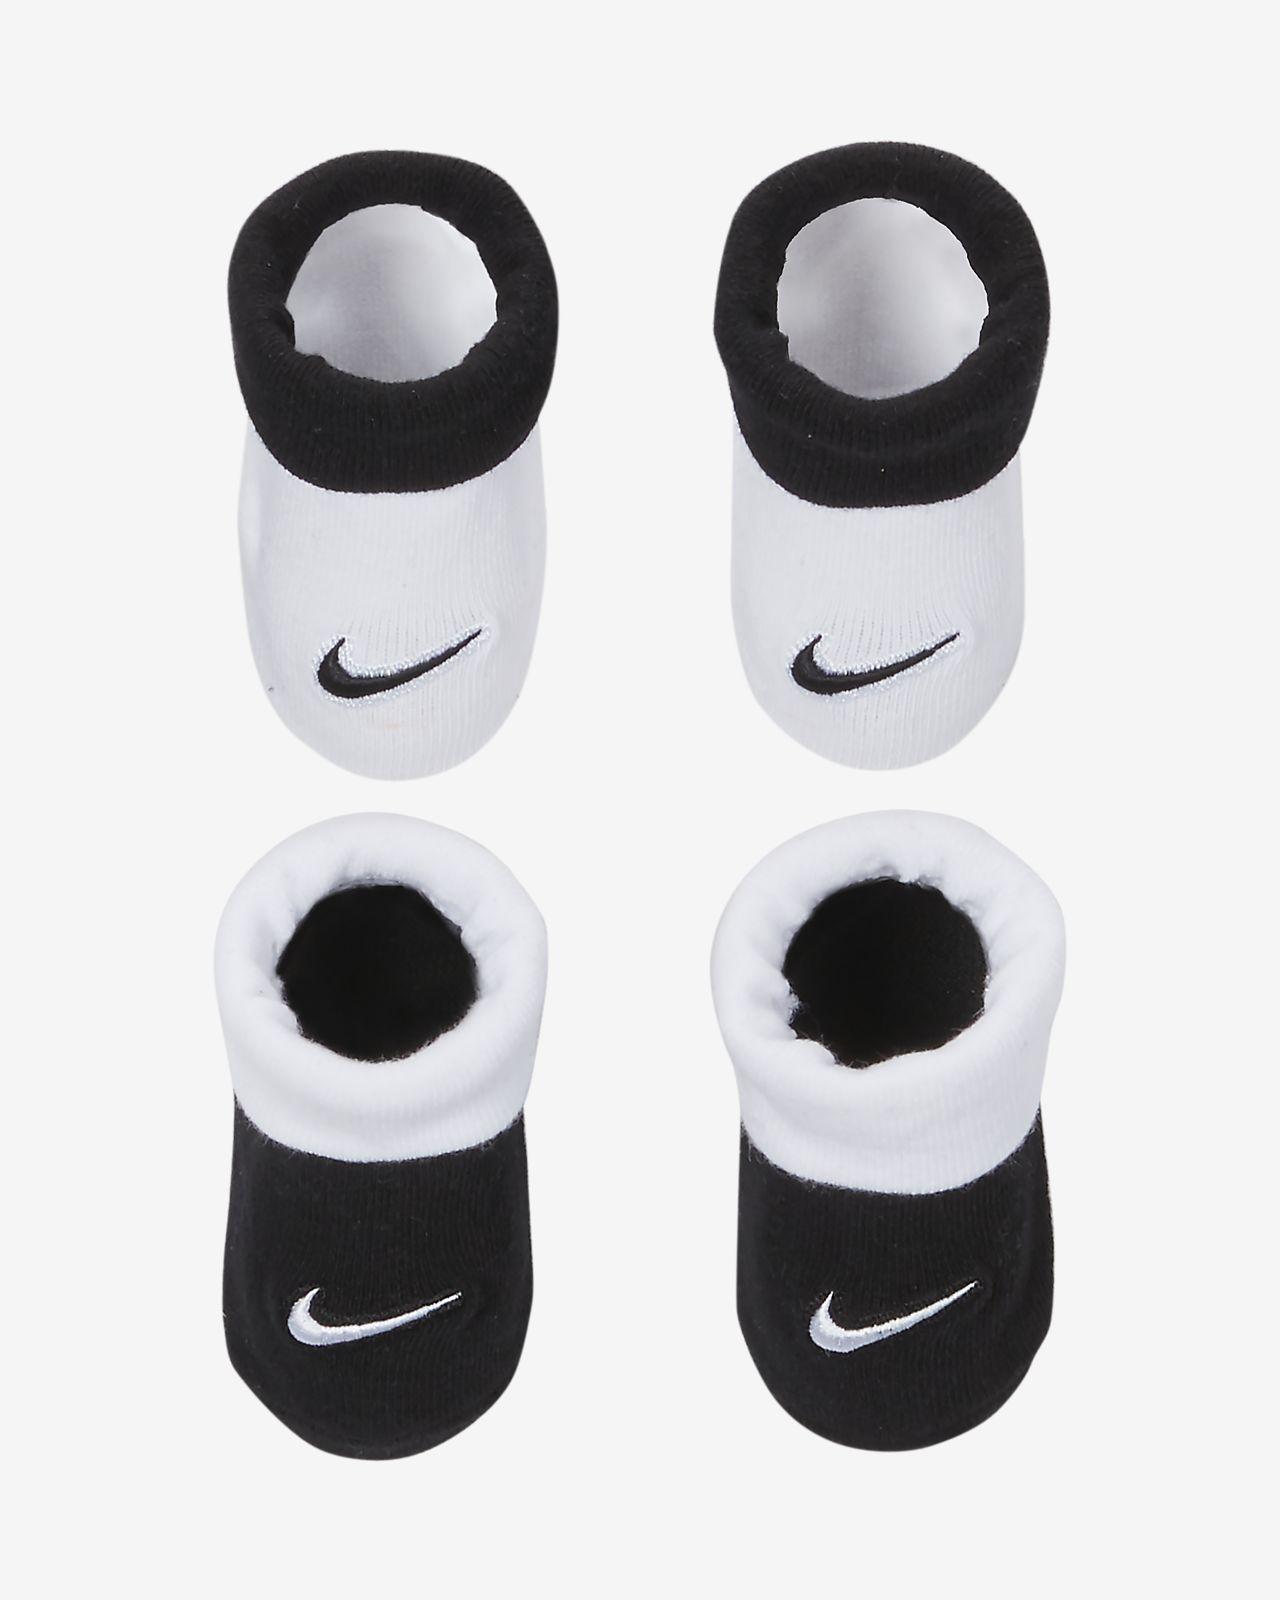 Nike Baby (0-6M) Booties (2 Pairs)